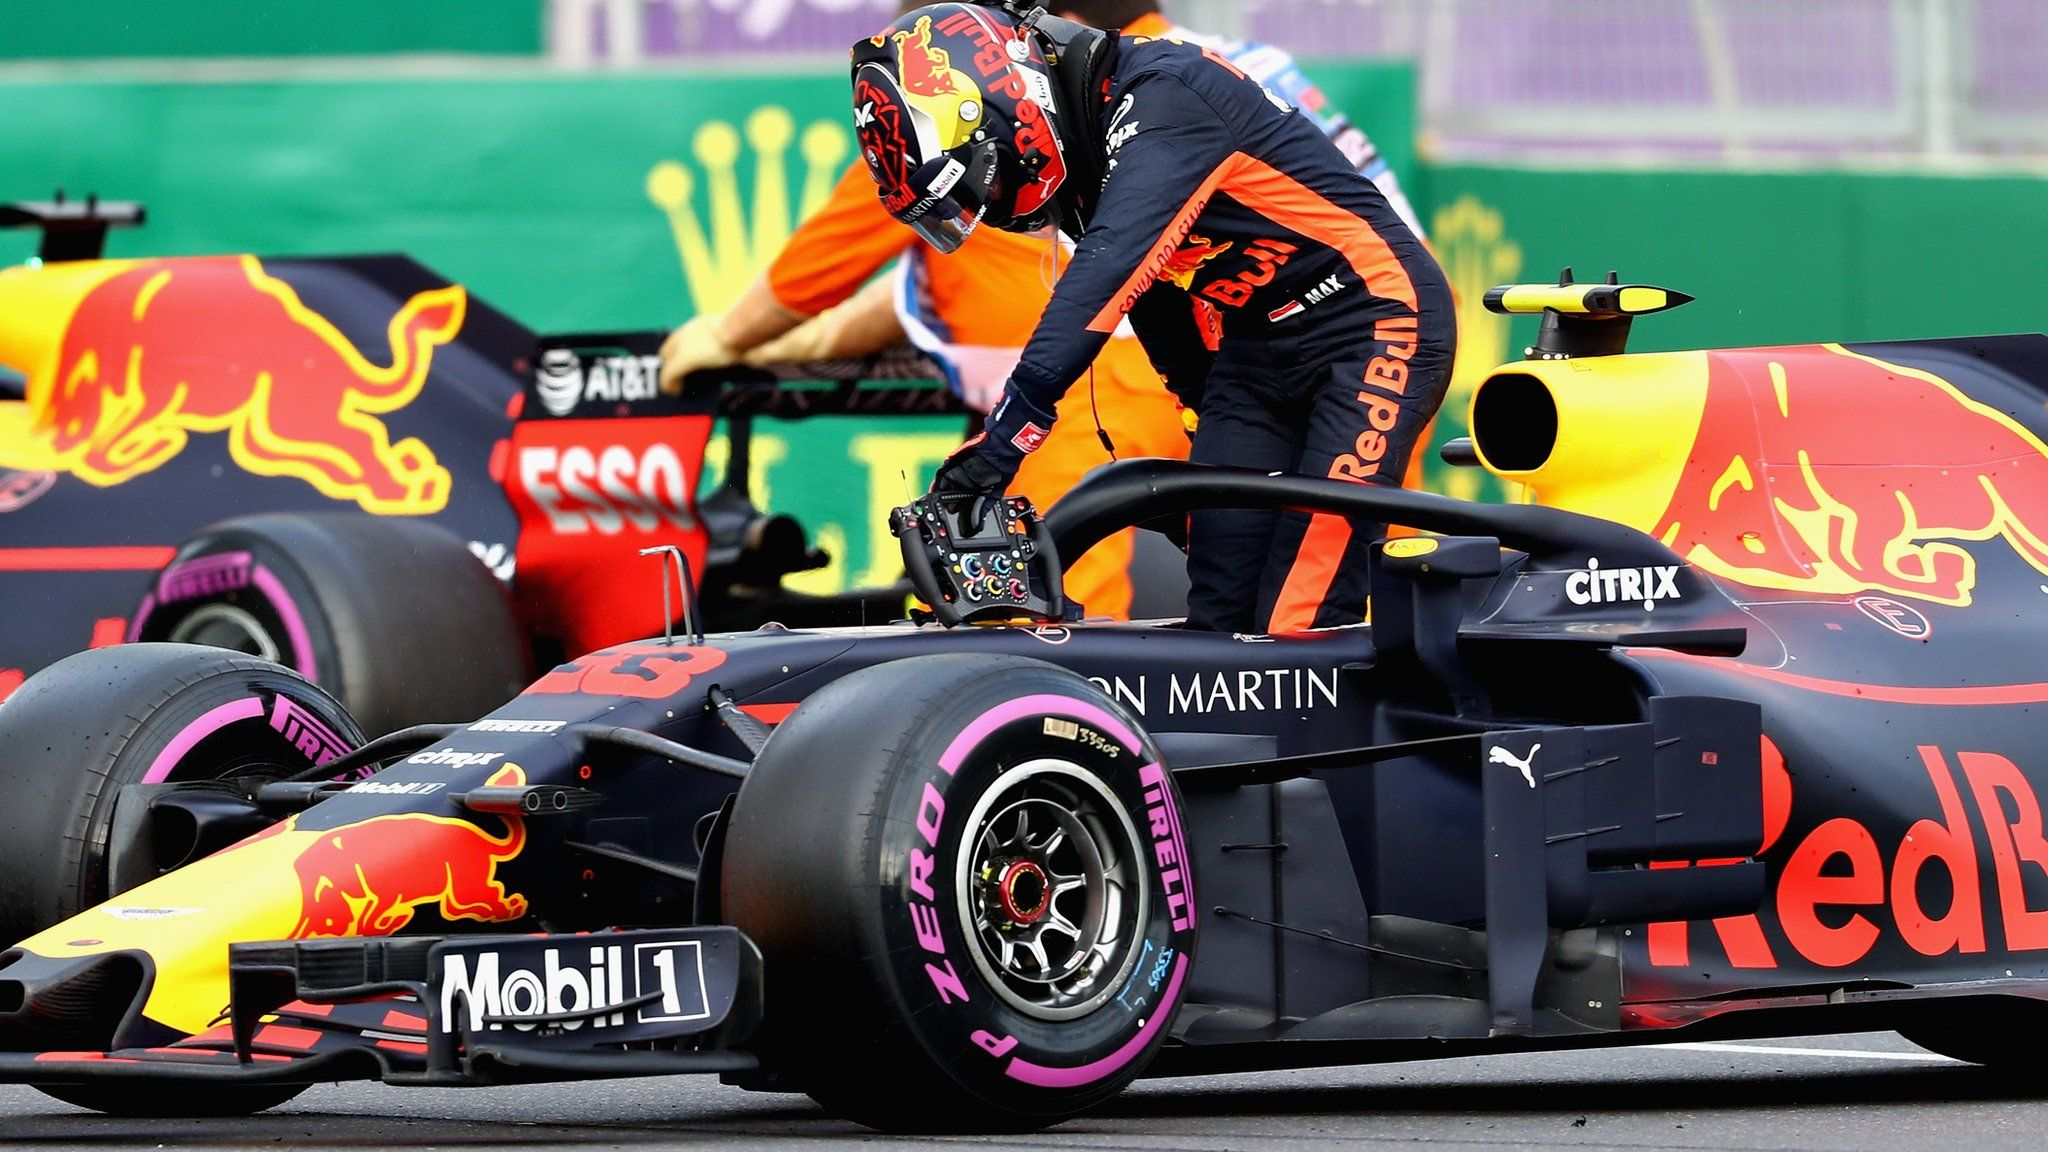 Azerbaijan Grand Prix Red Bull crash 'unacceptable', says